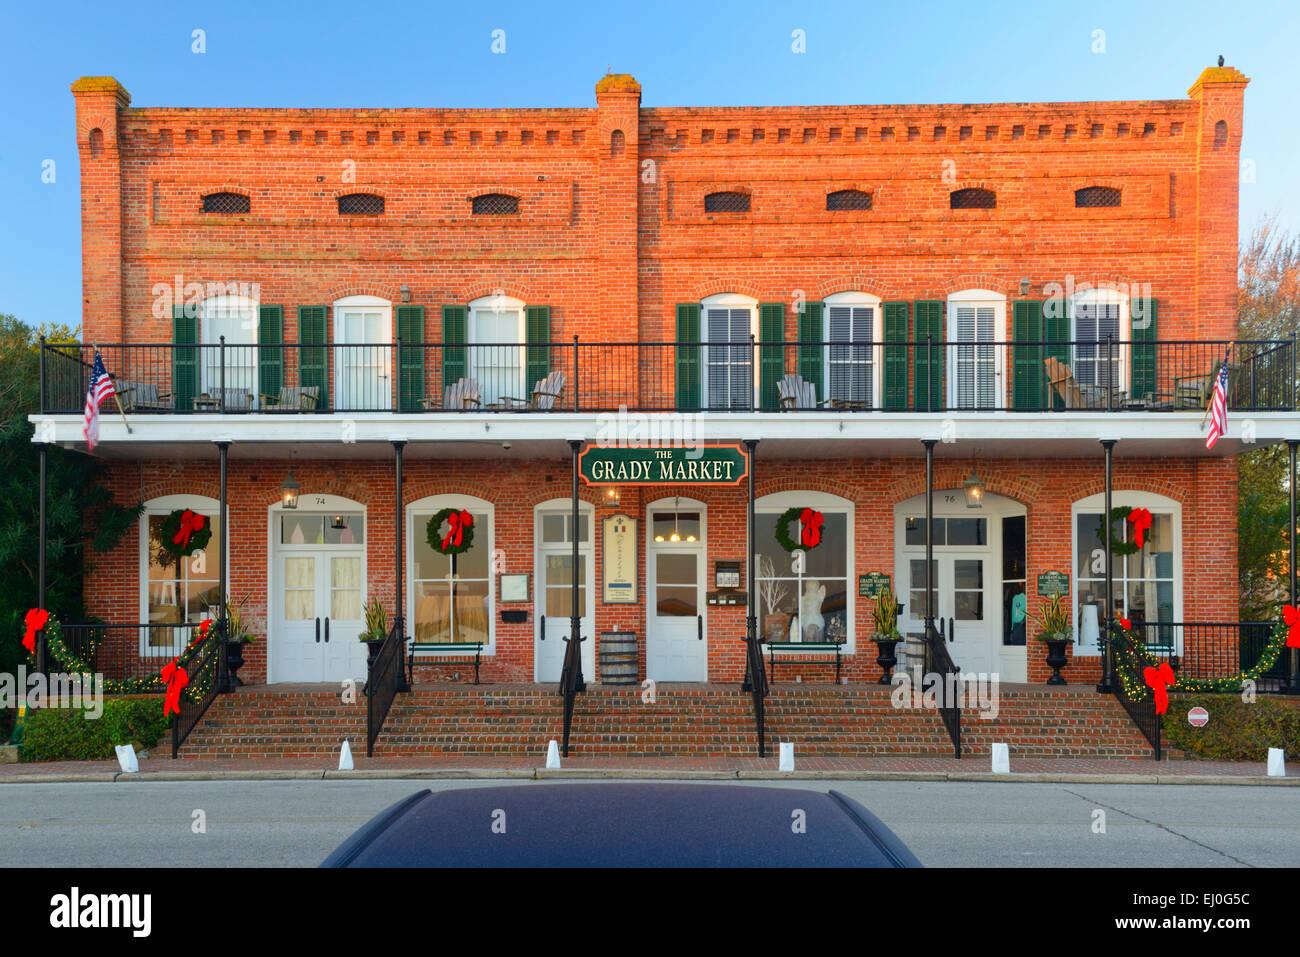 USA, Florida, Franklin County, Apalachicola, Grady Market - Stock Image